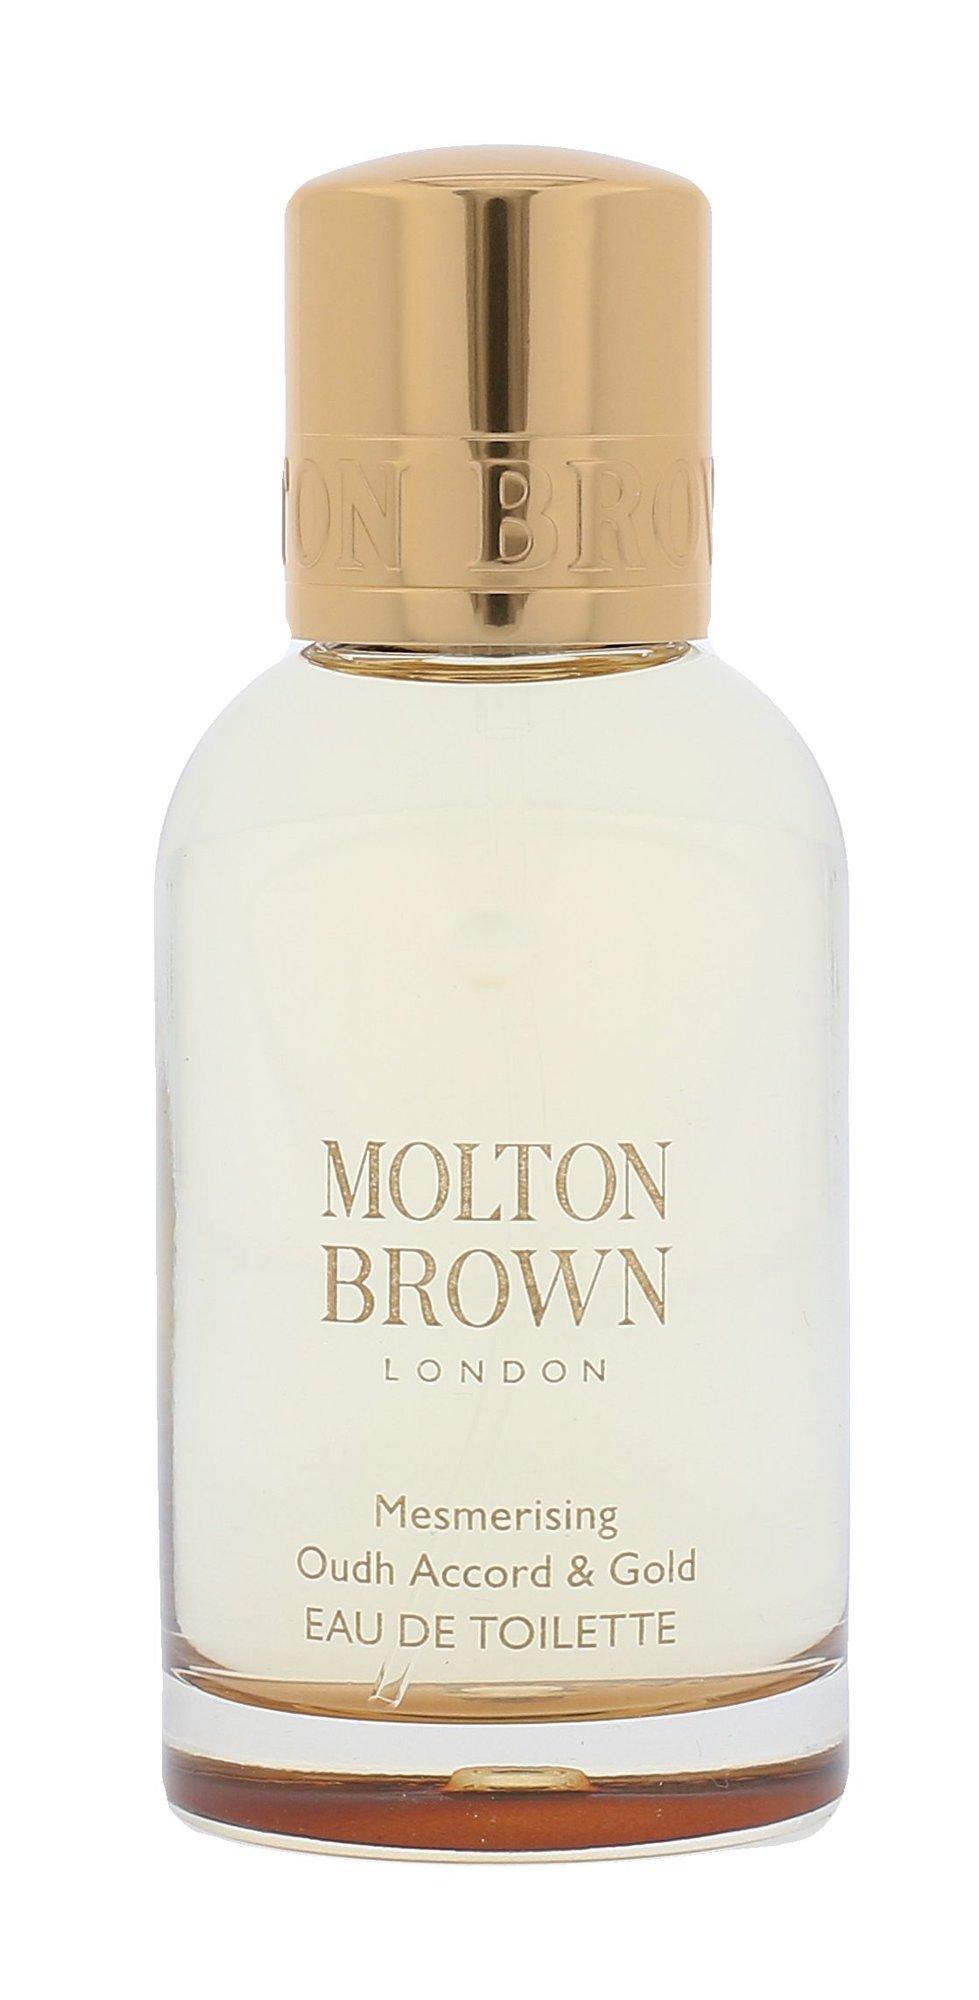 Molton Brown Mesmerising Oudh Accord & Gold EDT 50ml